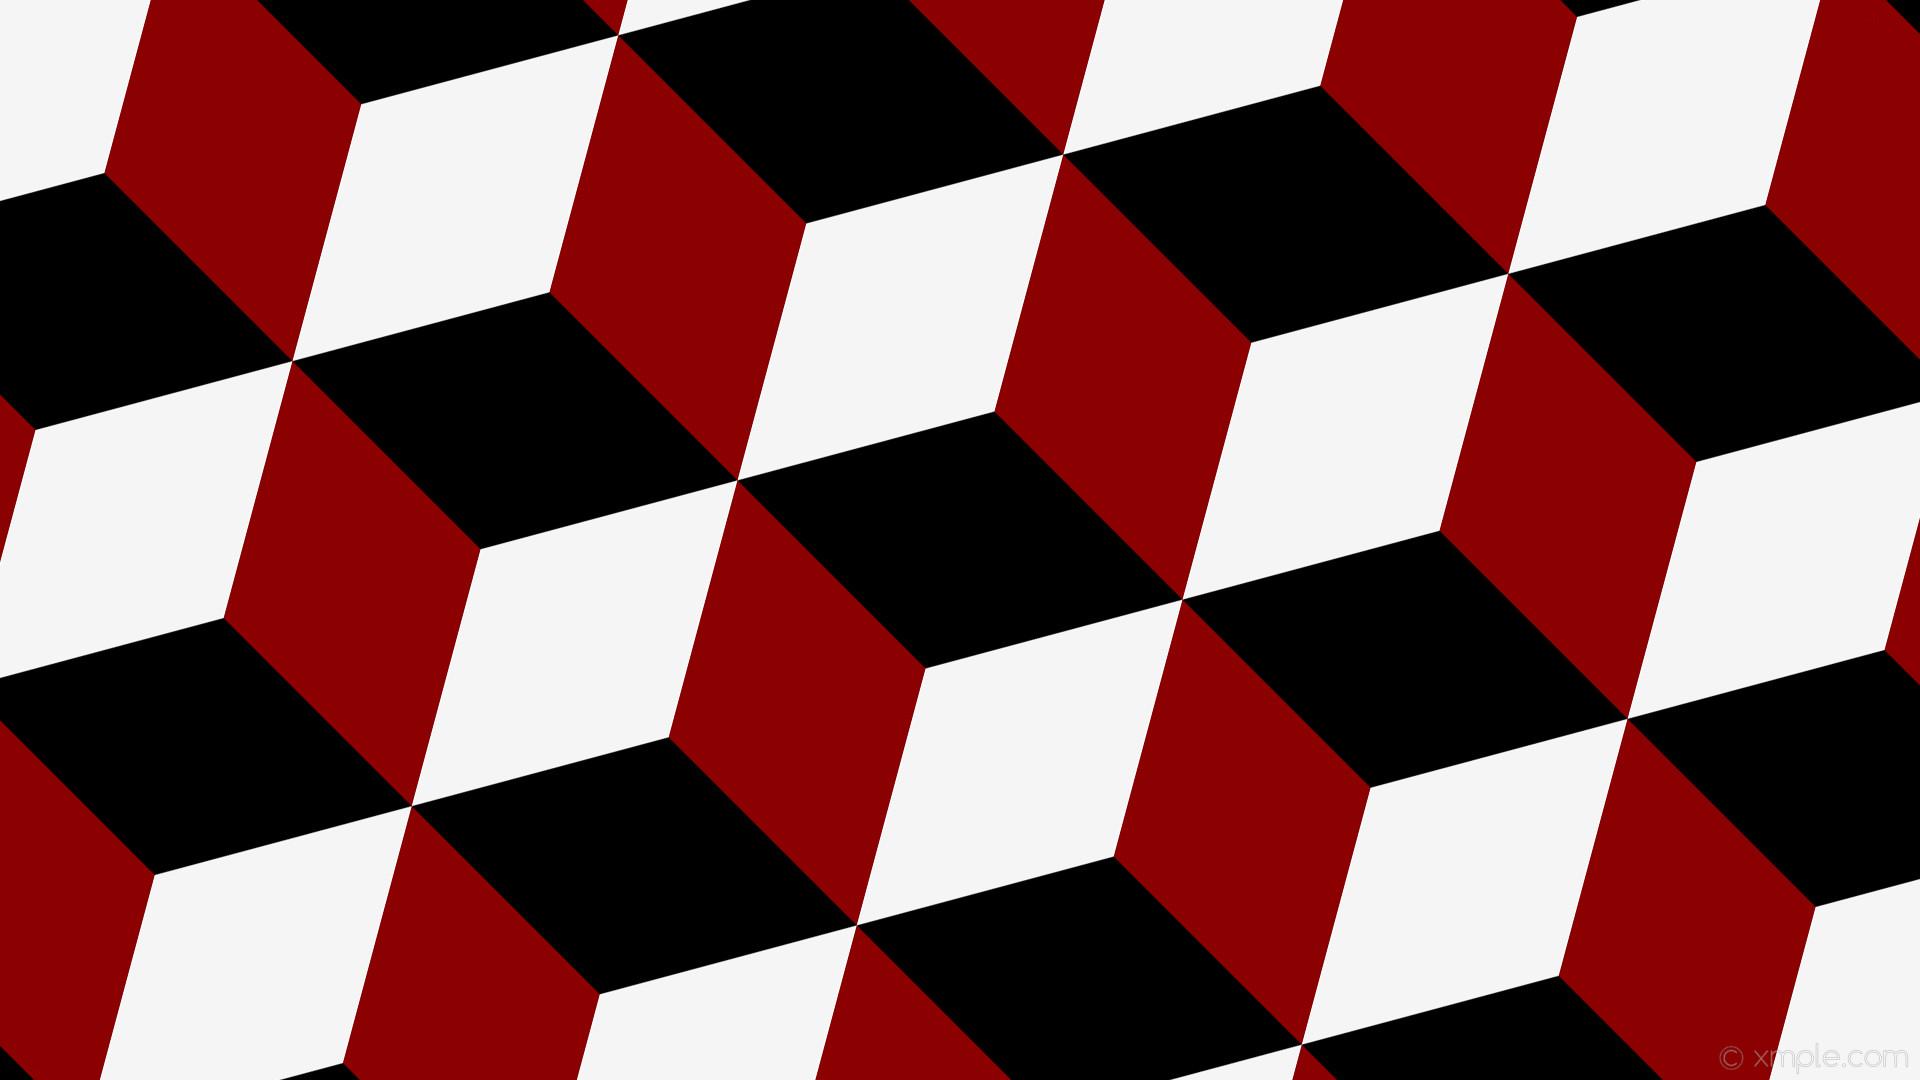 black red and white wallpaper 64 images. Black Bedroom Furniture Sets. Home Design Ideas